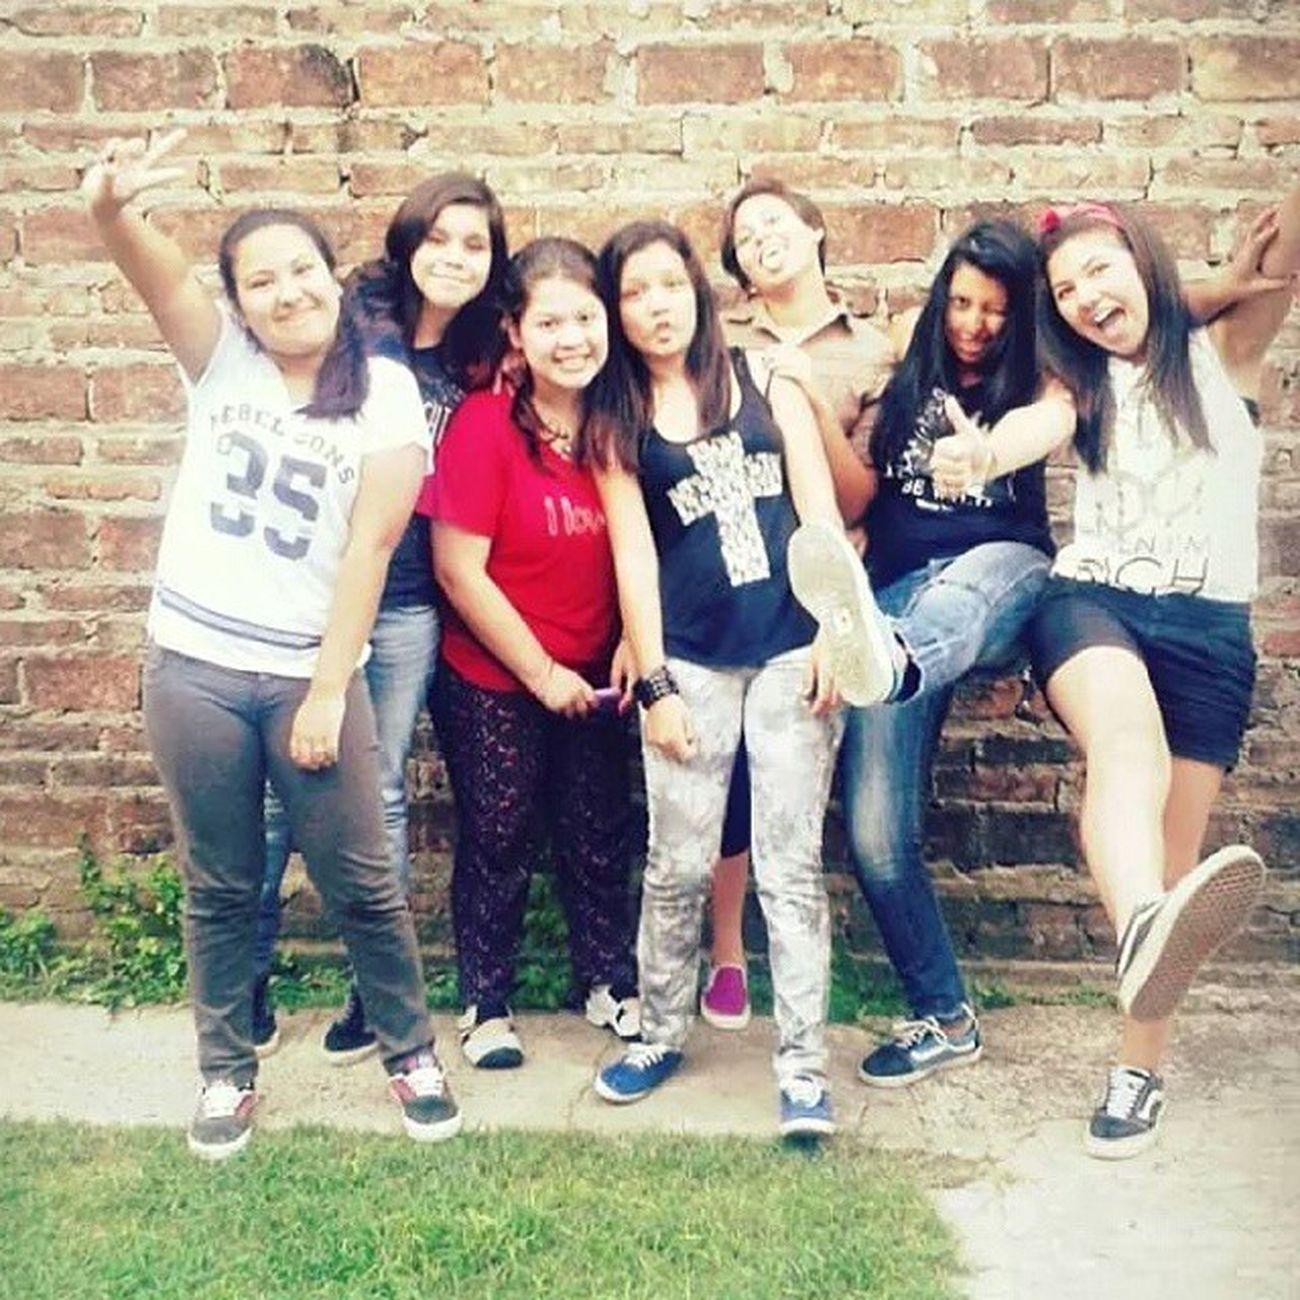 Las extraño fuerte. LasMD Love Friends Girls Ro NikiLaNenaBostera Eri Mica Me Taaty Mayra .